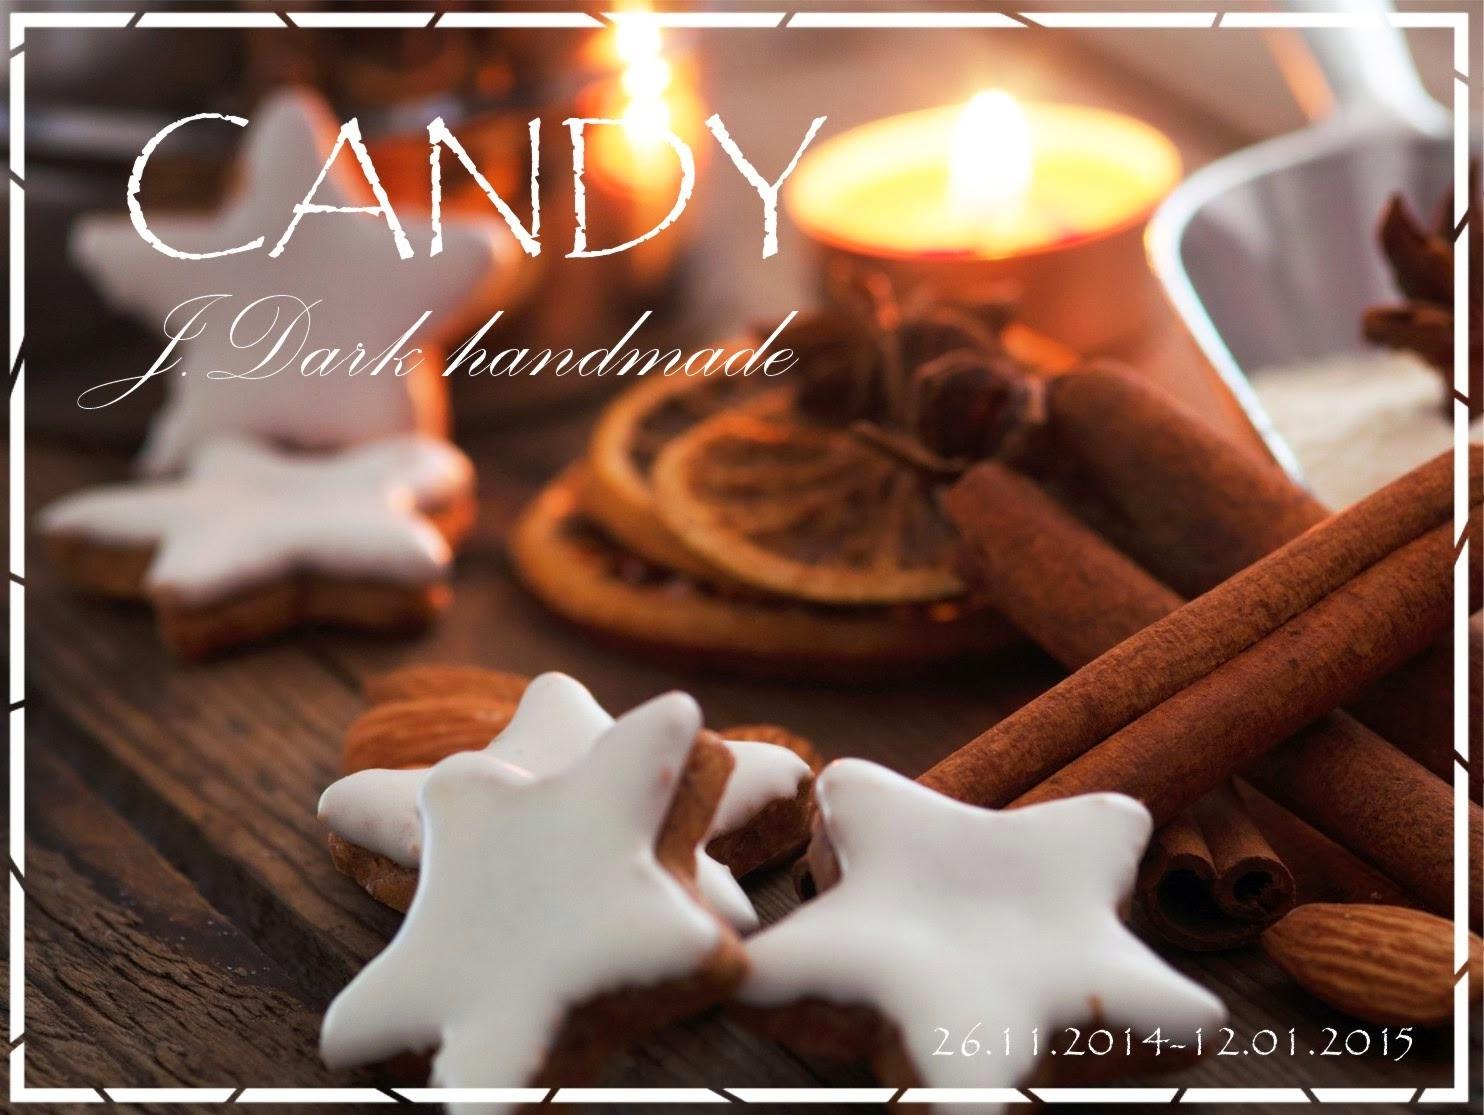 Candy u Dark